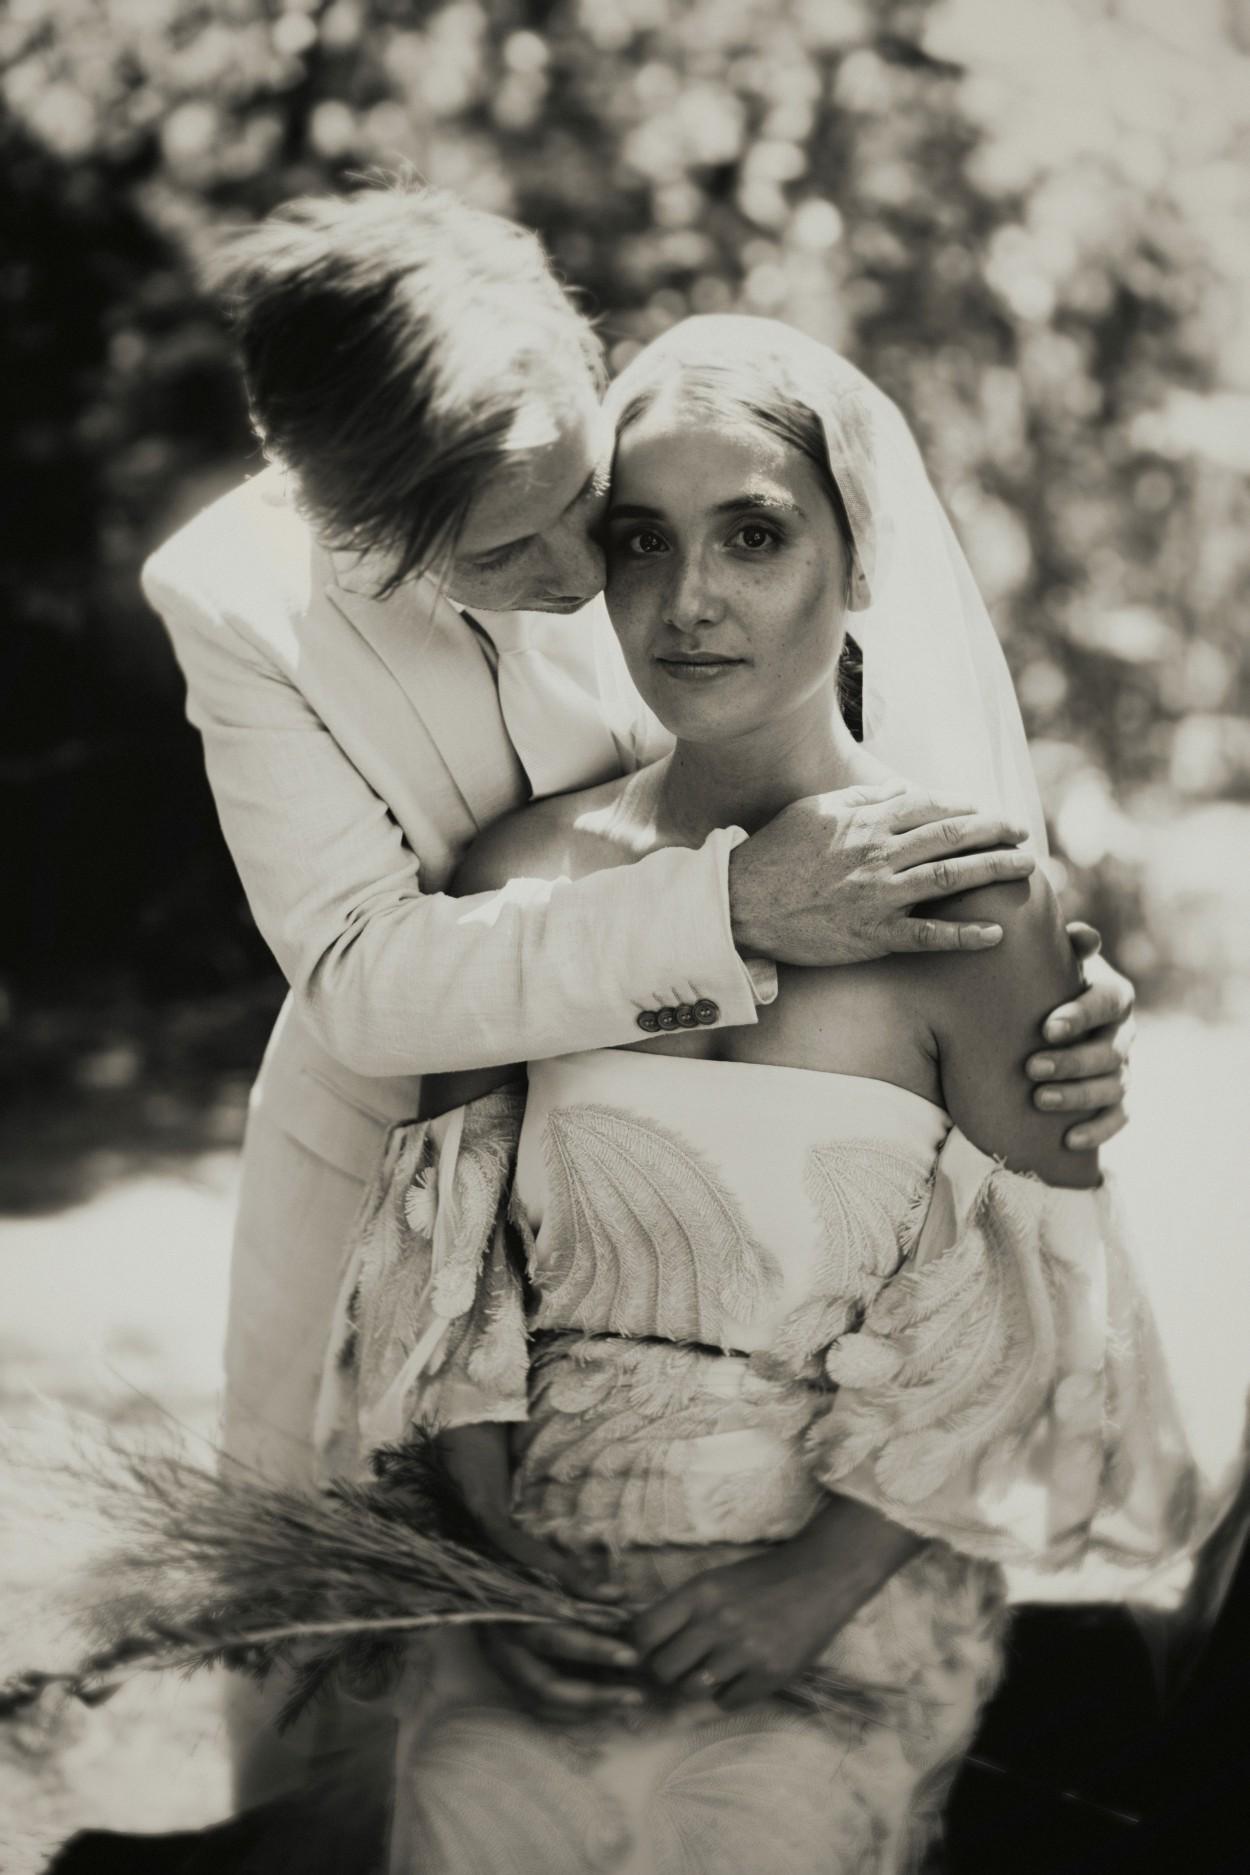 I-Got-You-Babe-Weddings-Heide-Museum-of-Modern-Art-Elopement-Susie-Nathan068.jpg